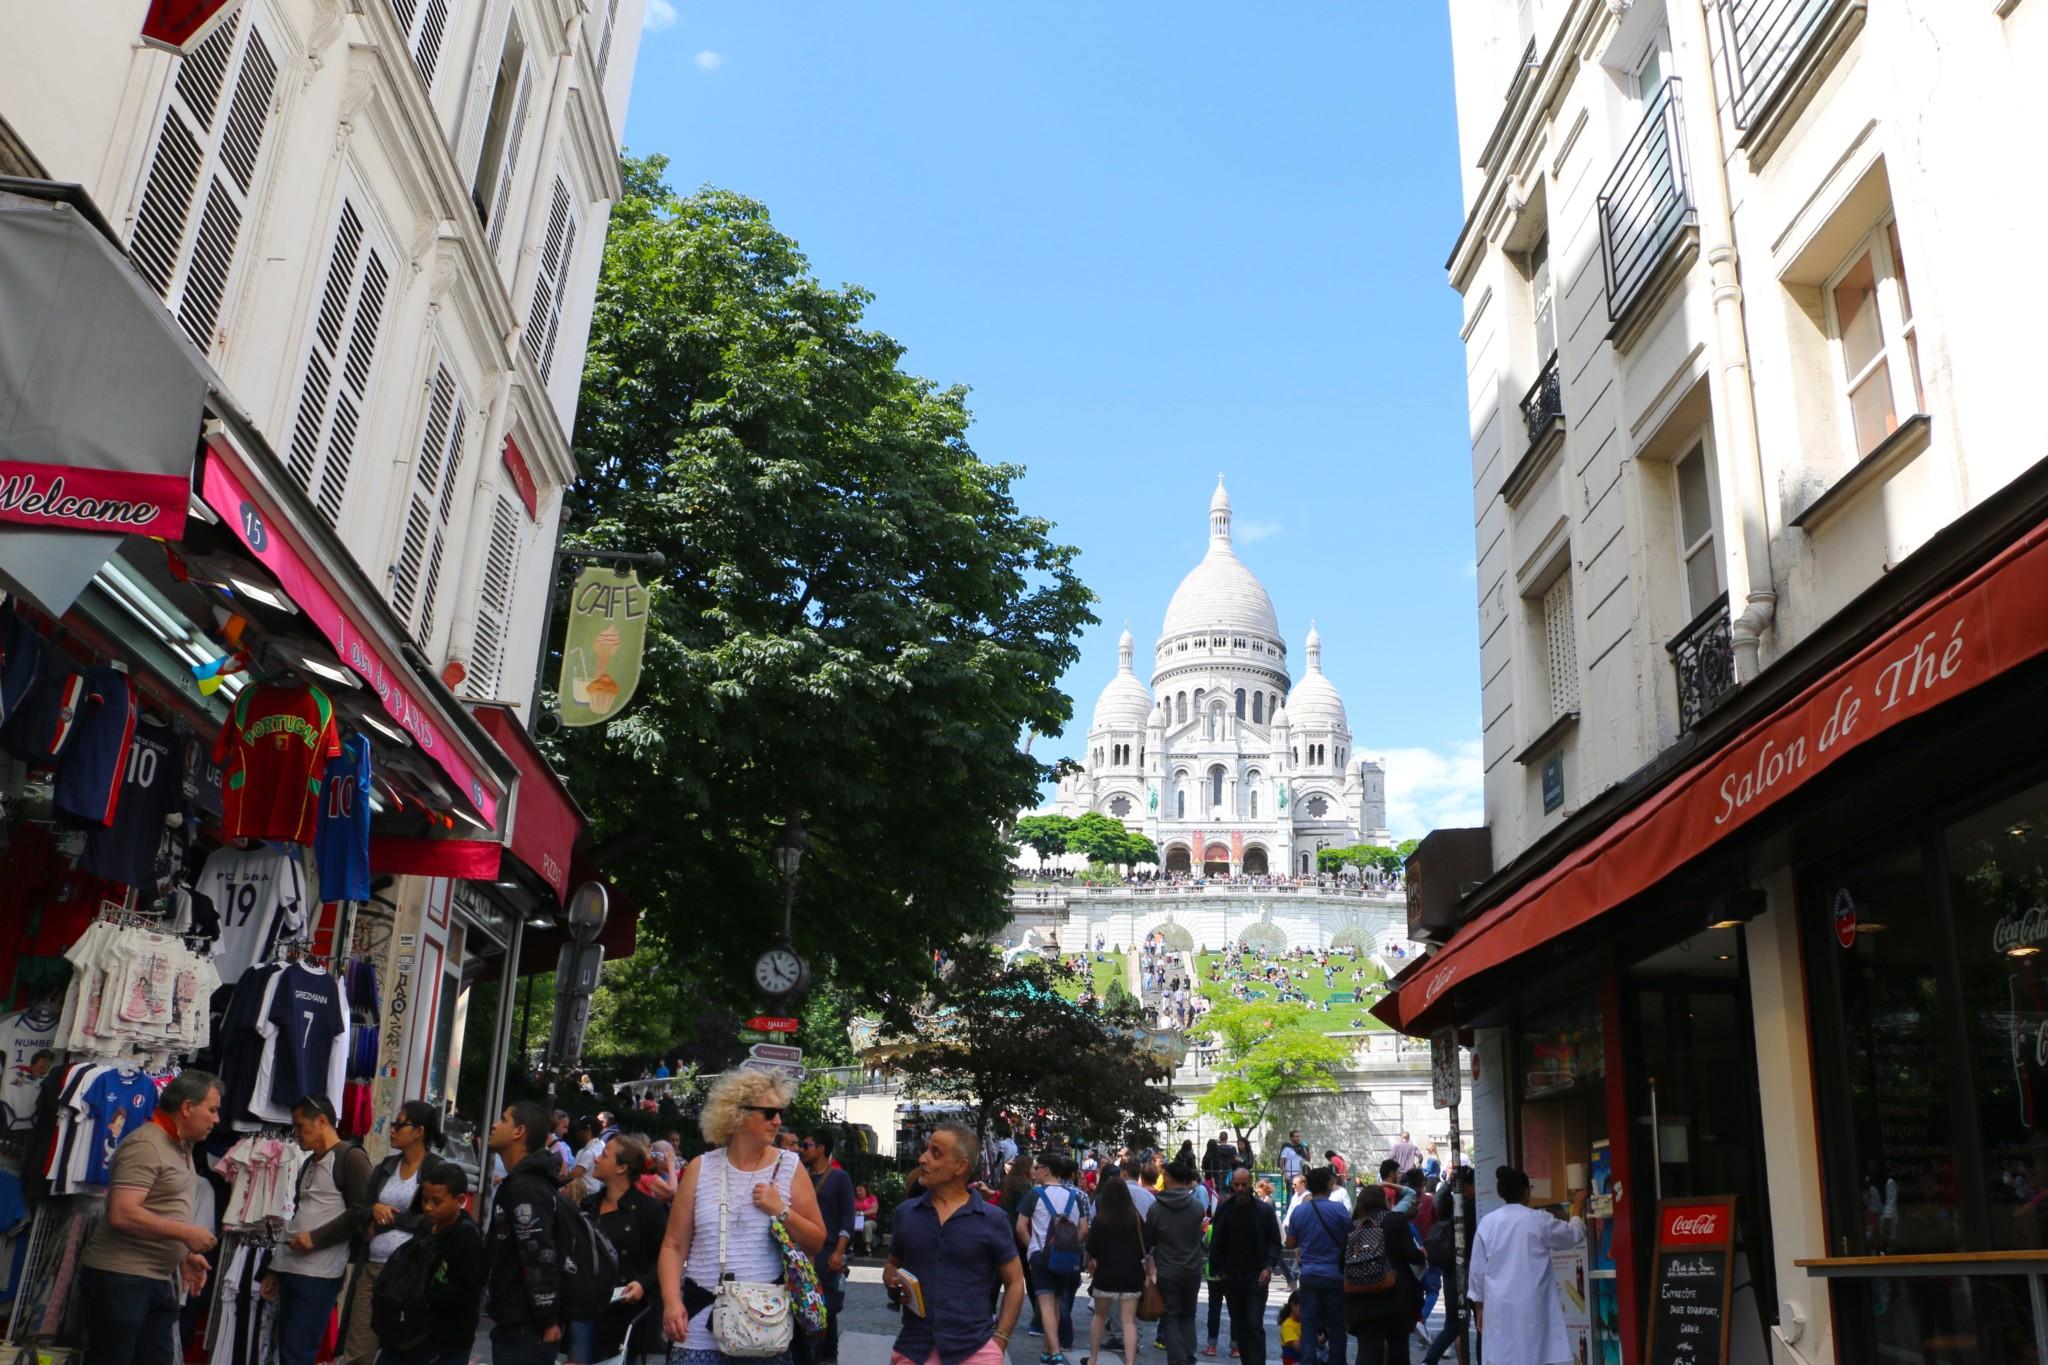 Meandering through Montmartre